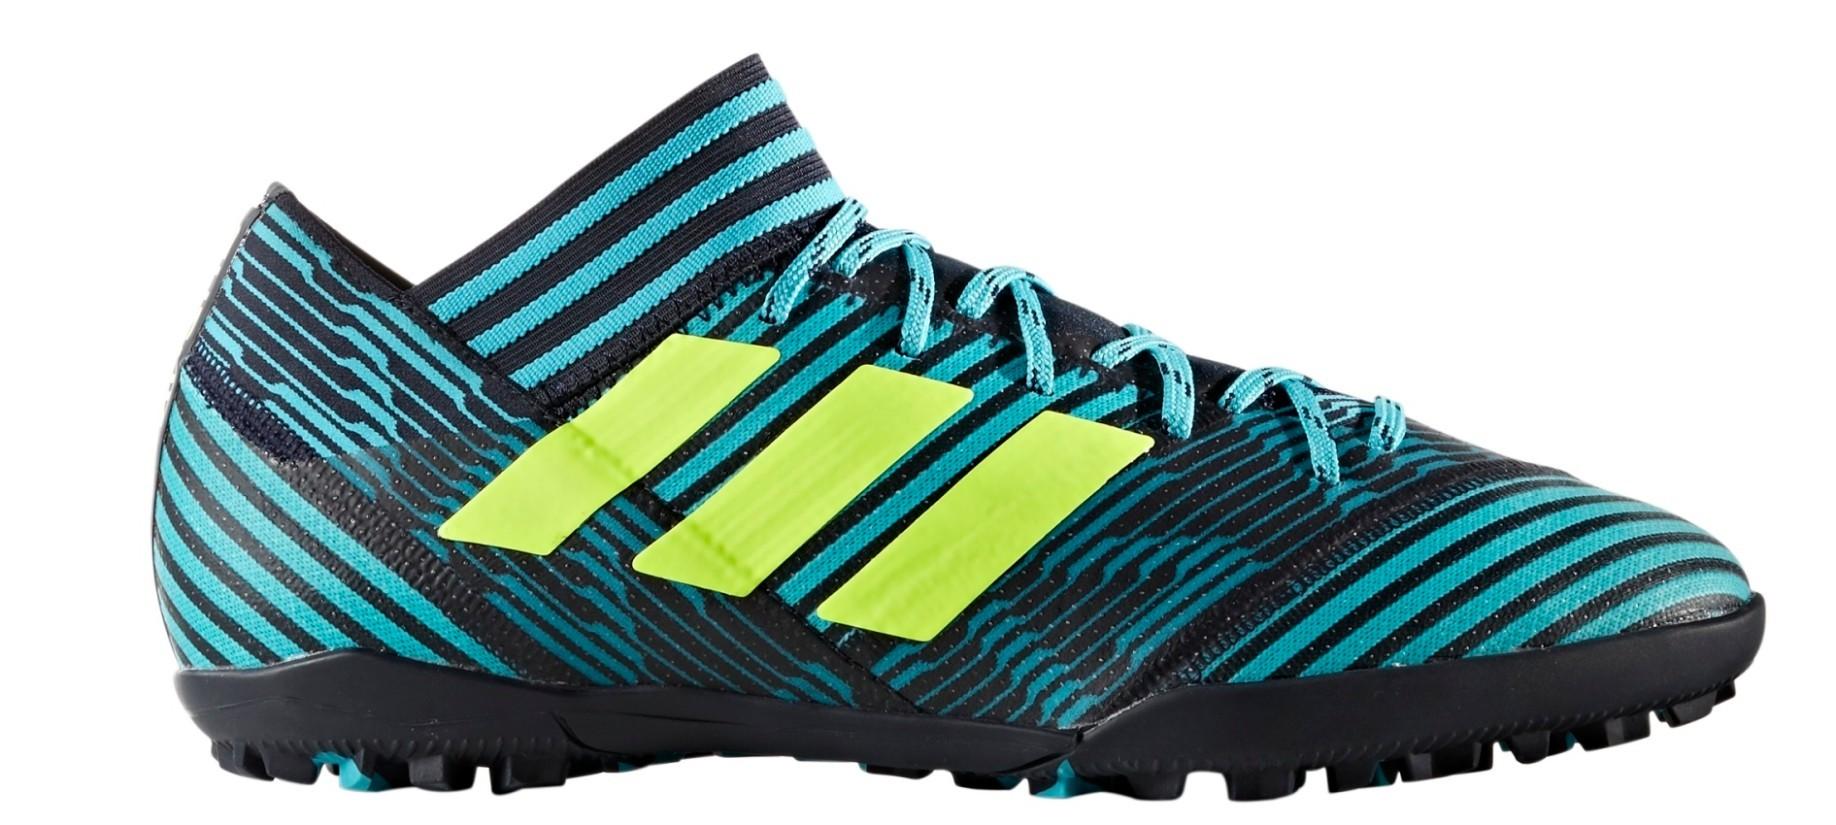 hot sale online ae240 19378 Adidas Football boots Nemeziz Tango 17.3 TF Ocean Storm Pack colore Blue -  Adidas - SportIT.com